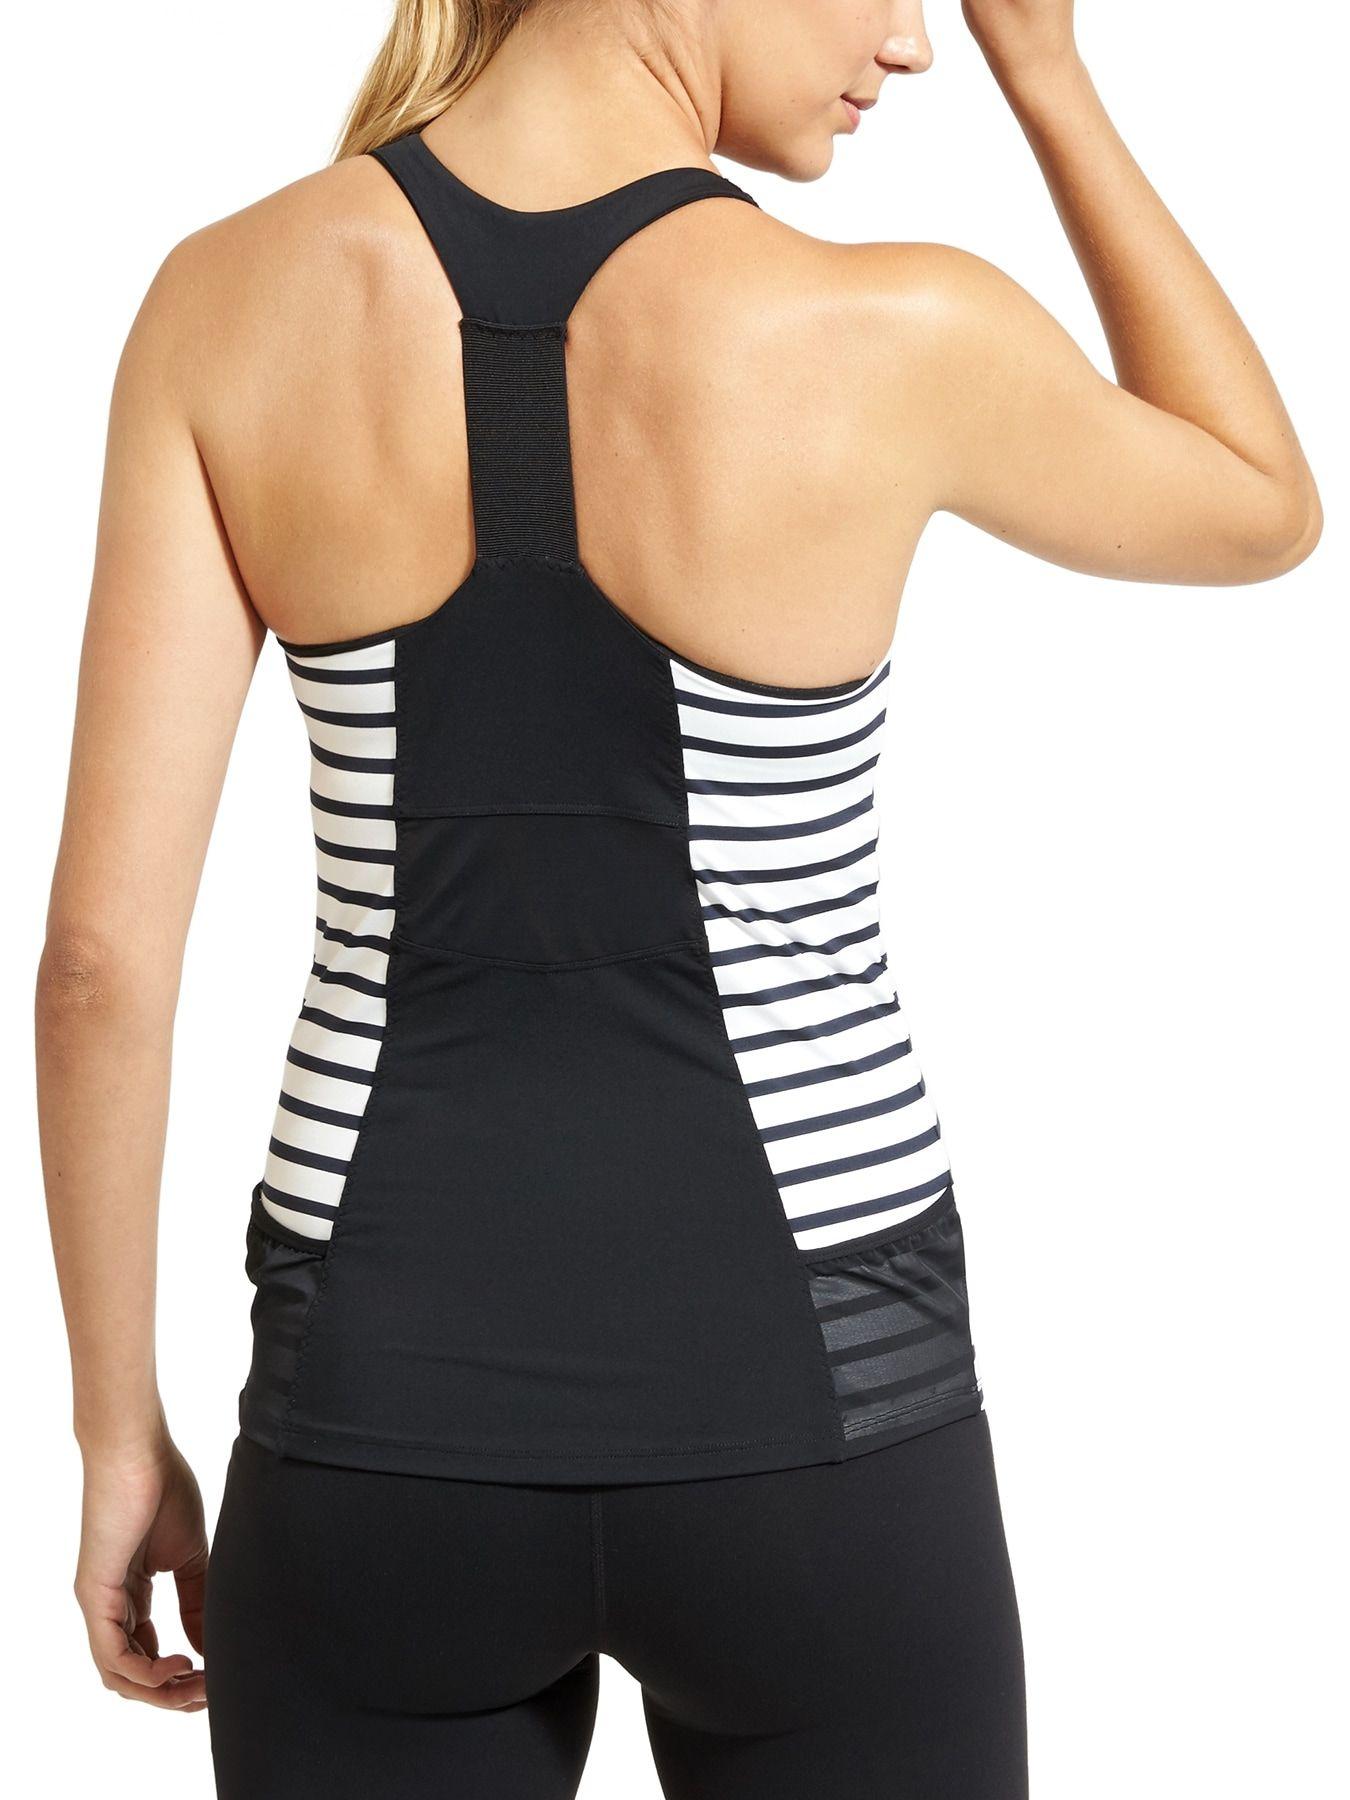 Stripe Ace Racer Activewear fashion, Athleta, Athletic